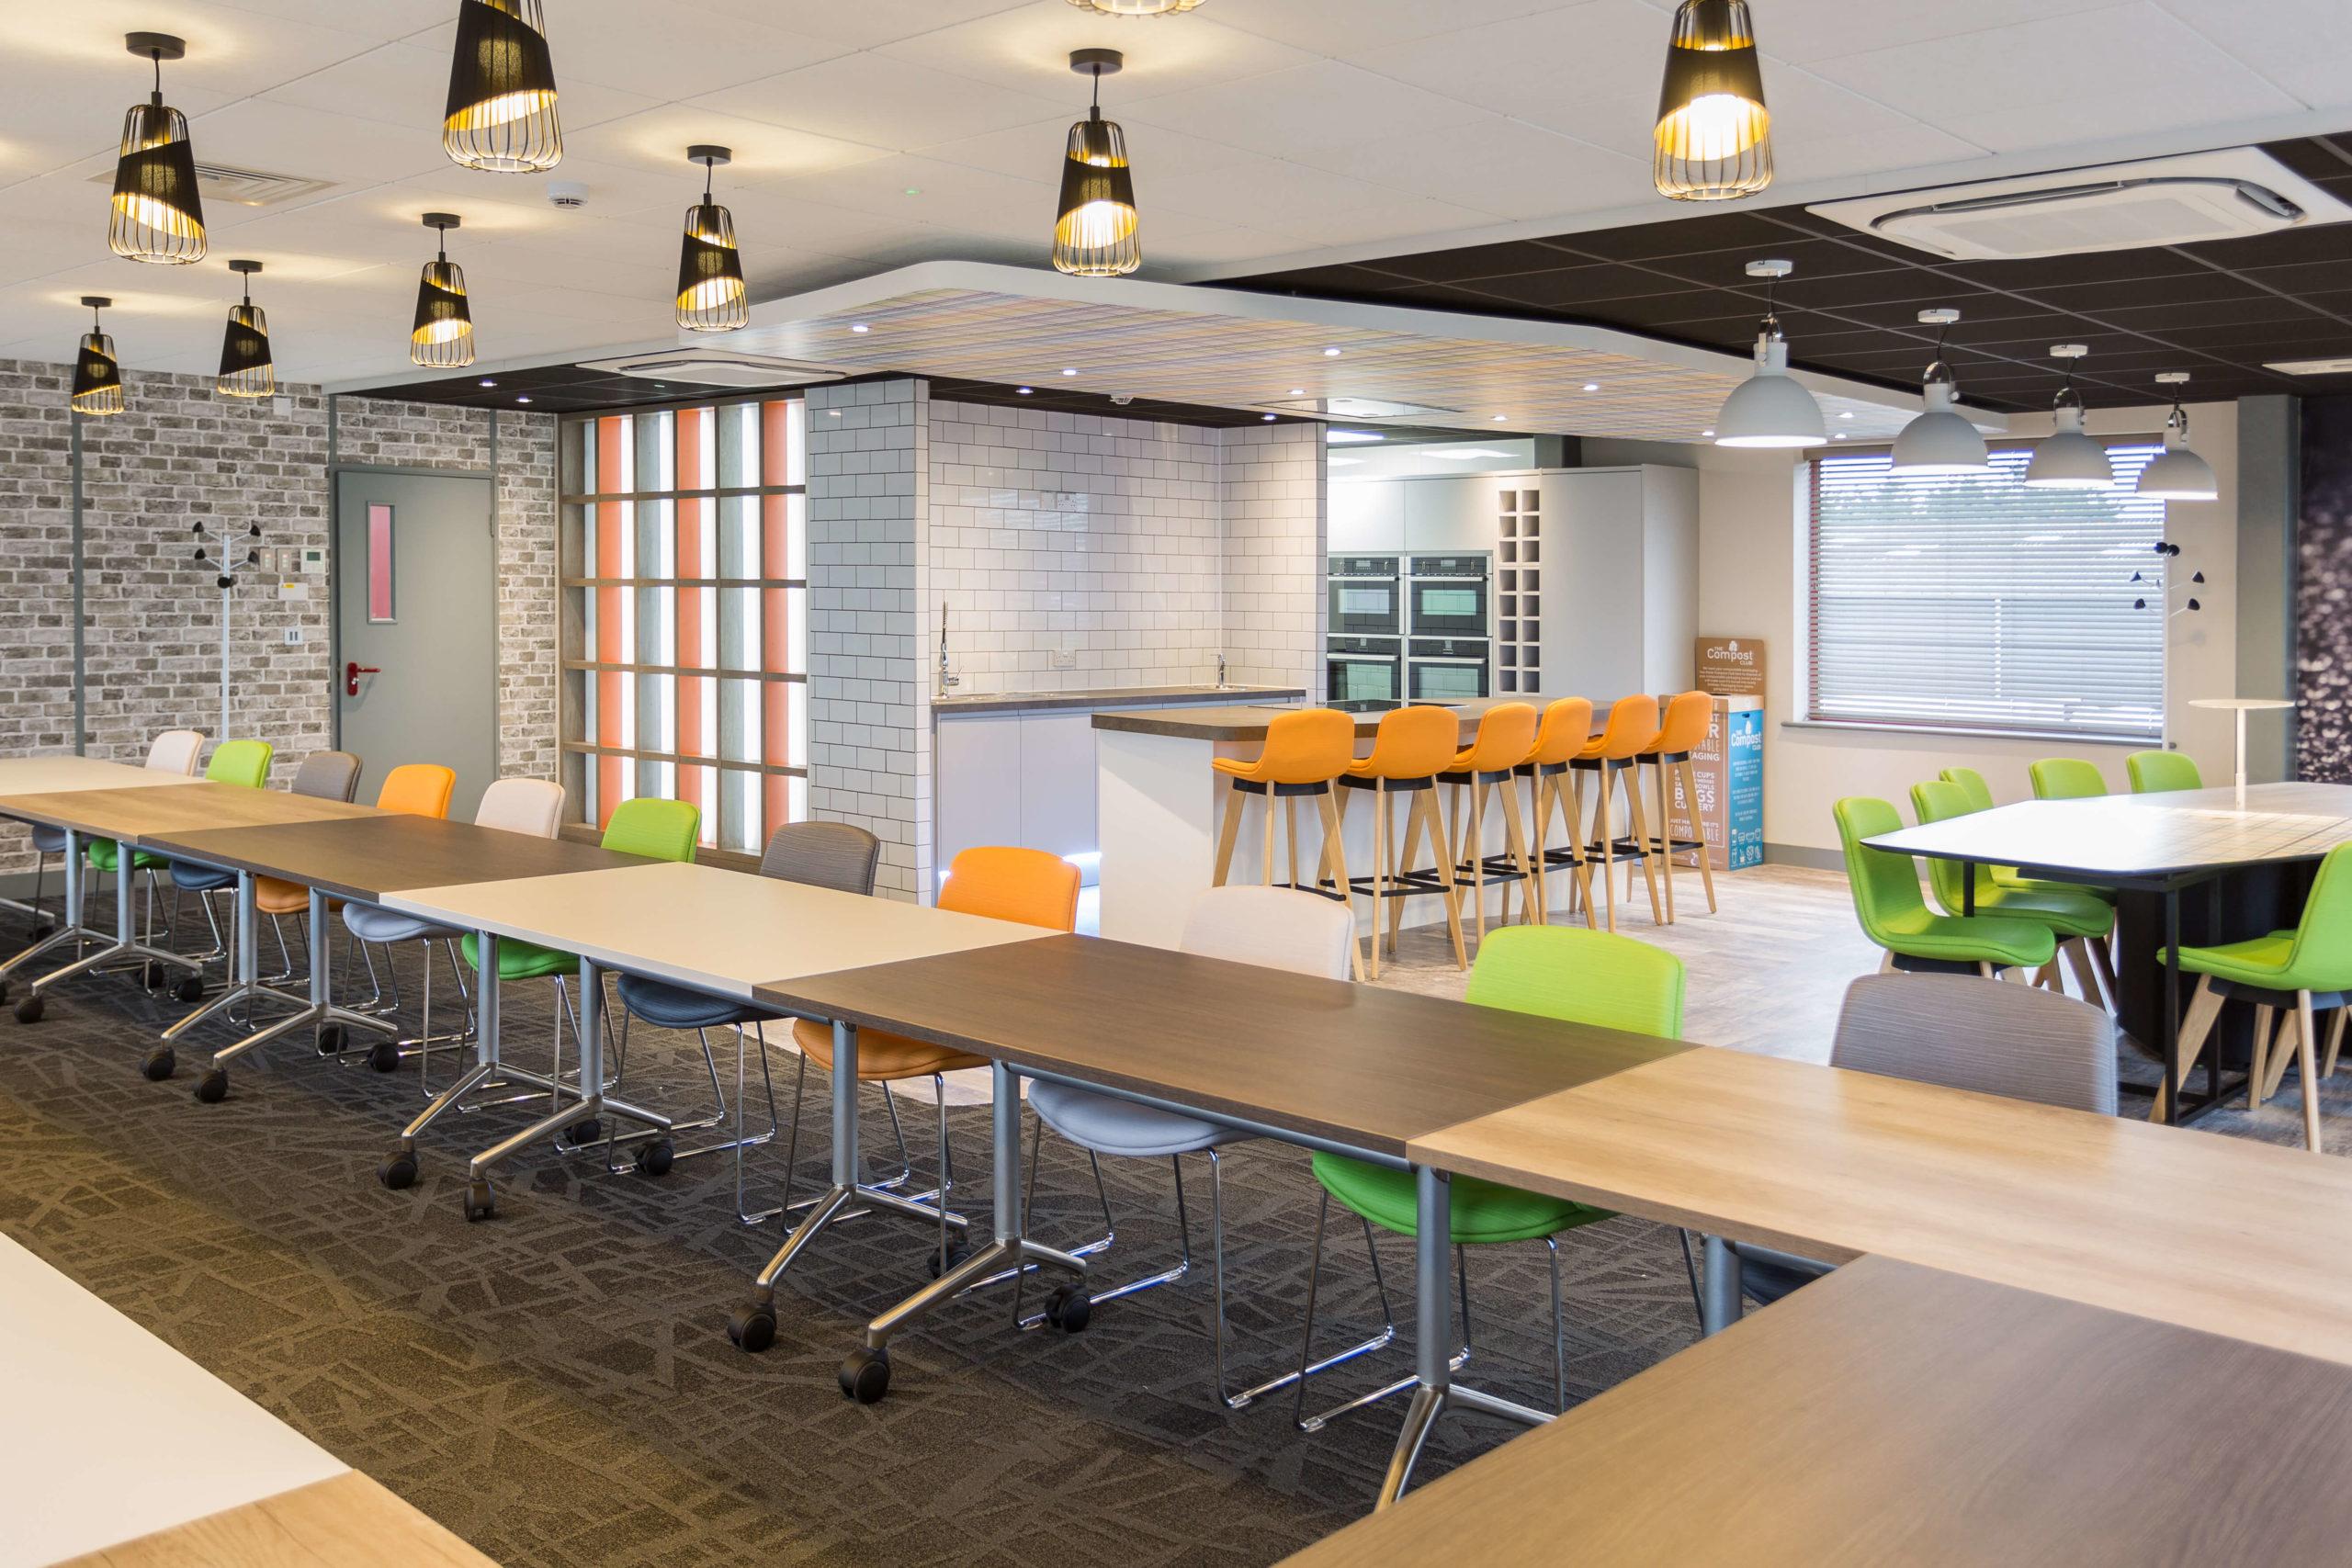 Modern Commercial Breakoutspace Design